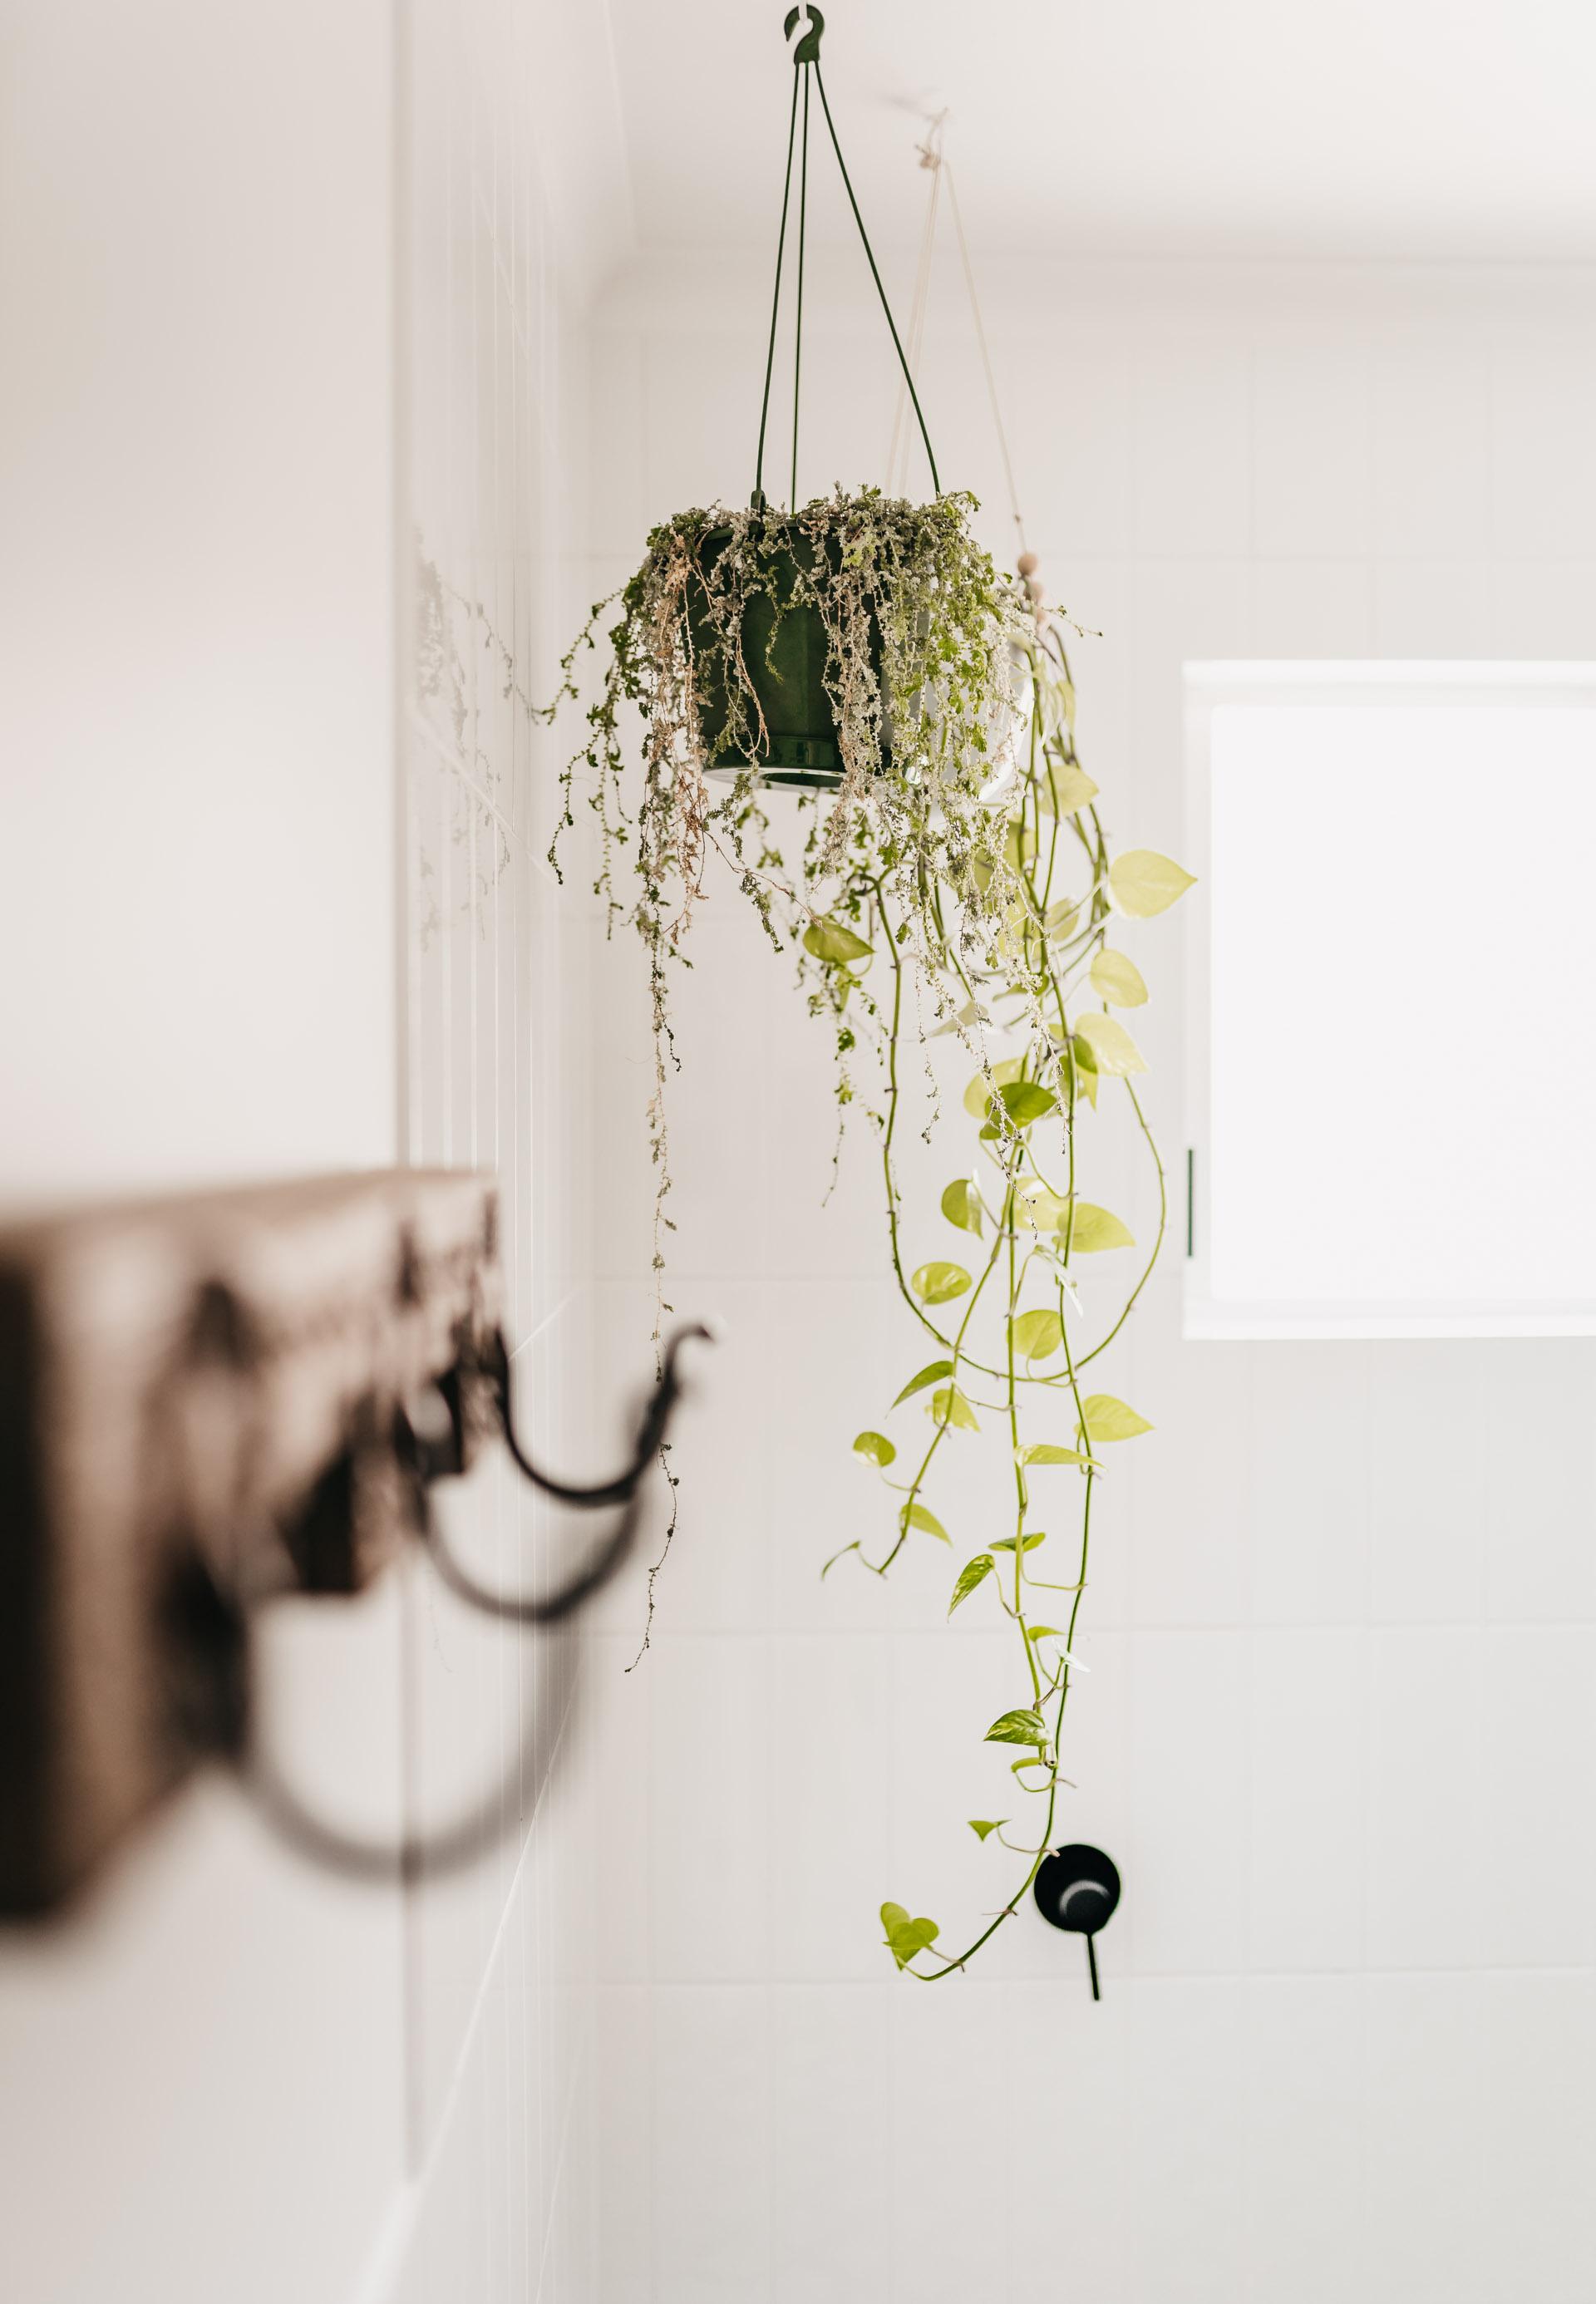 keira-mason-caba-cottage-bathroom-plants-details.jpg